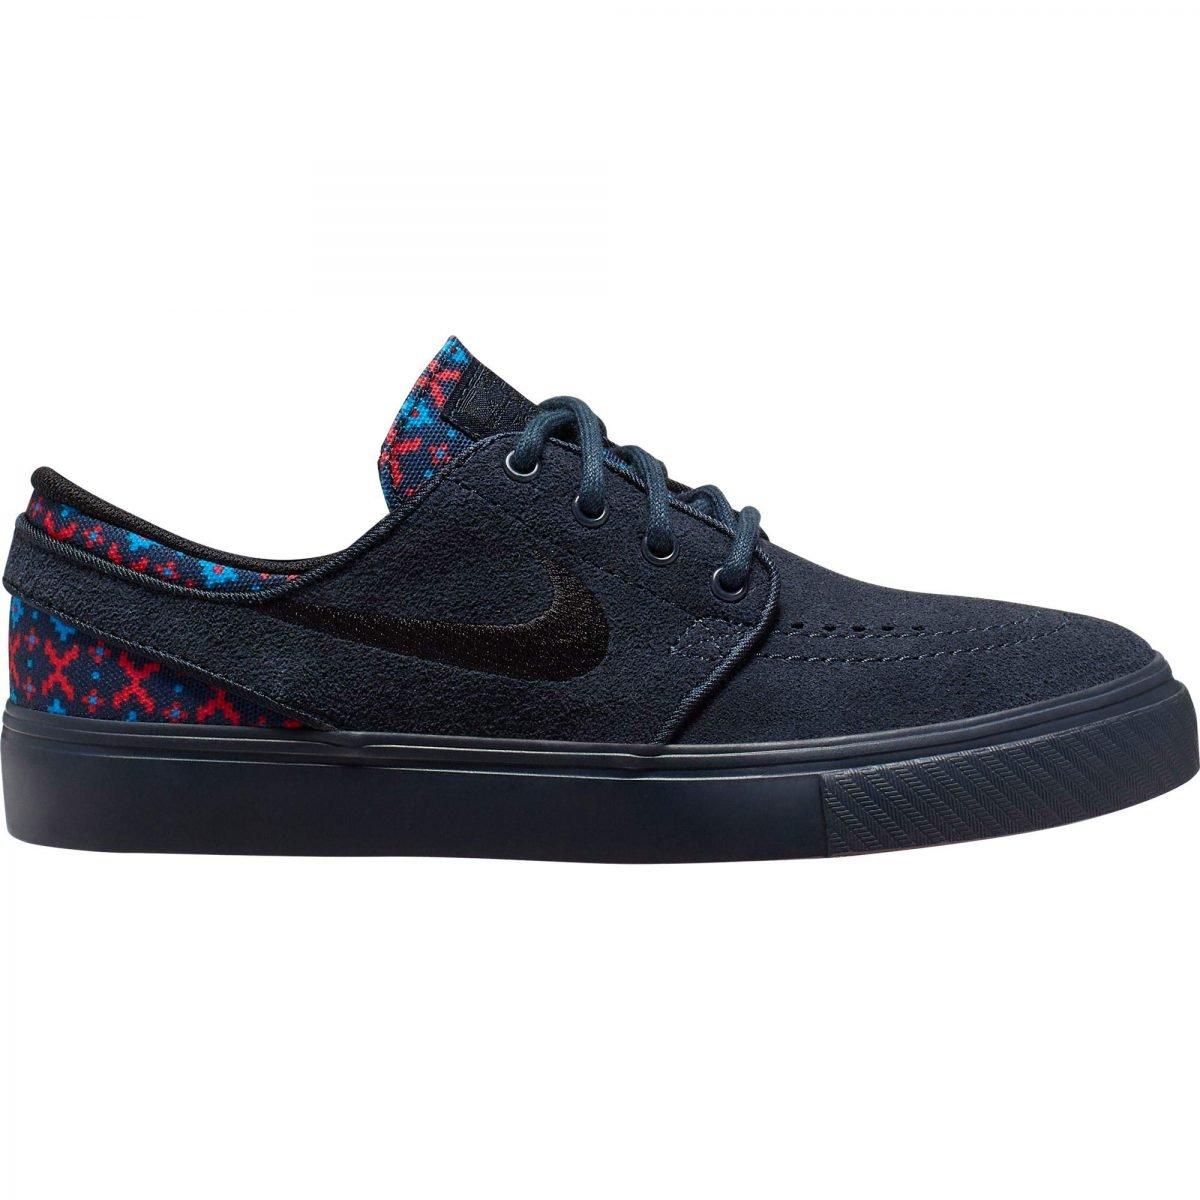 Nike SB Damen Sneaker Janoski Suede Premium